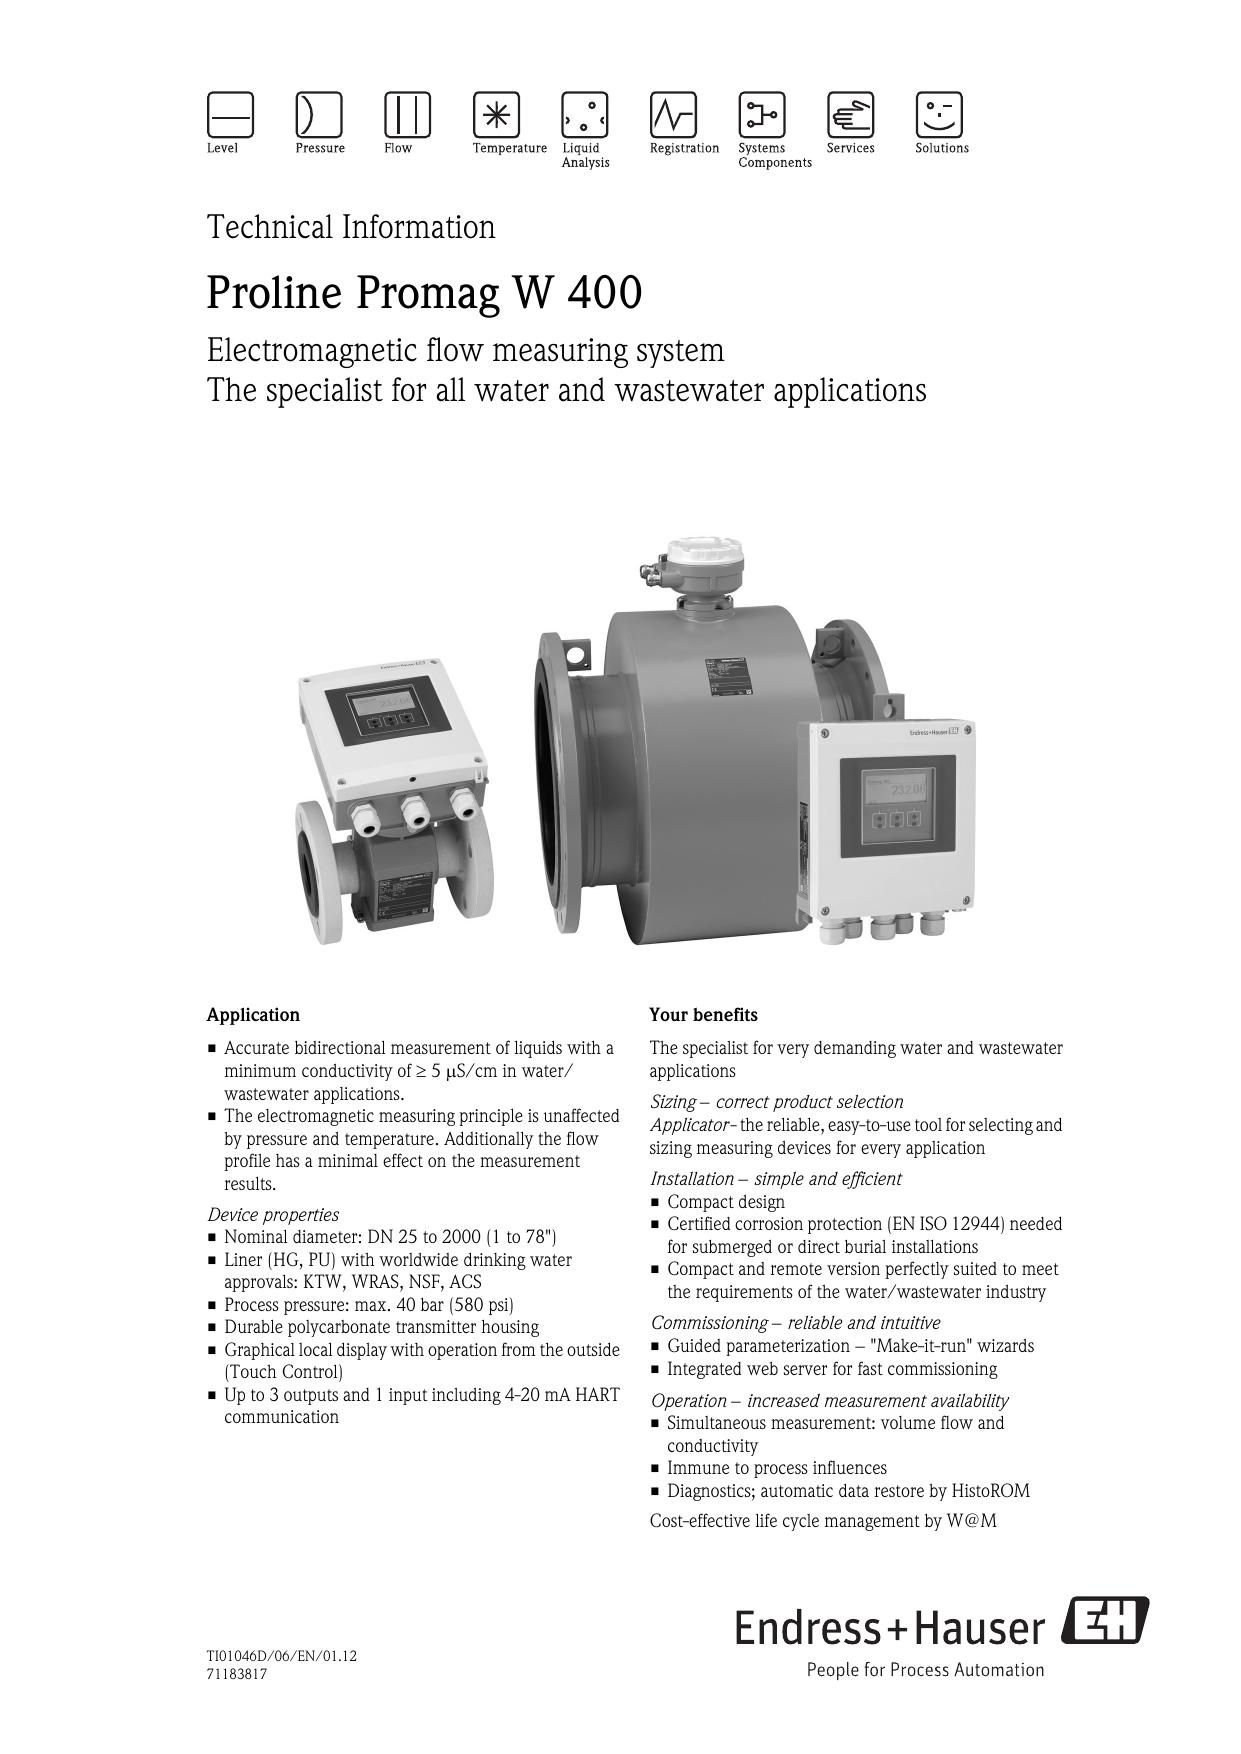 Proline Promag W 400 | manualzz com